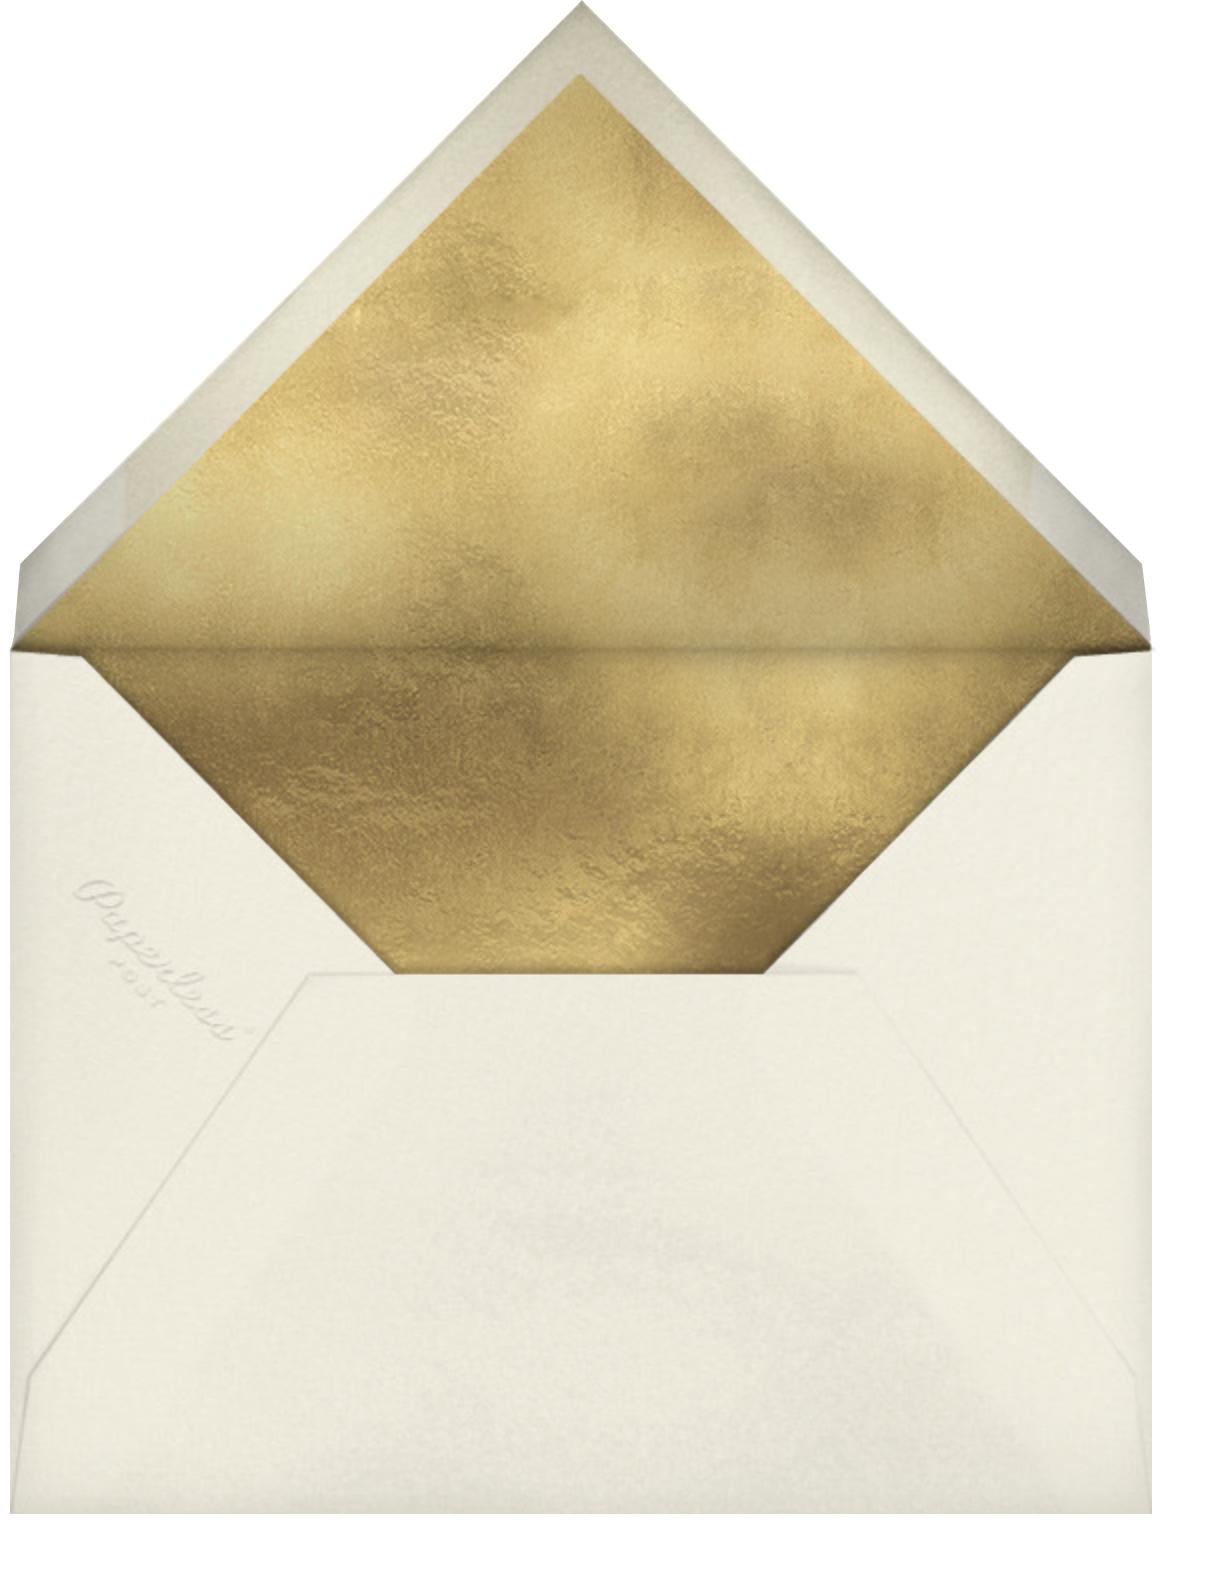 Greenery Frame - Greenwood - Paperless Post - Winter parties - envelope back